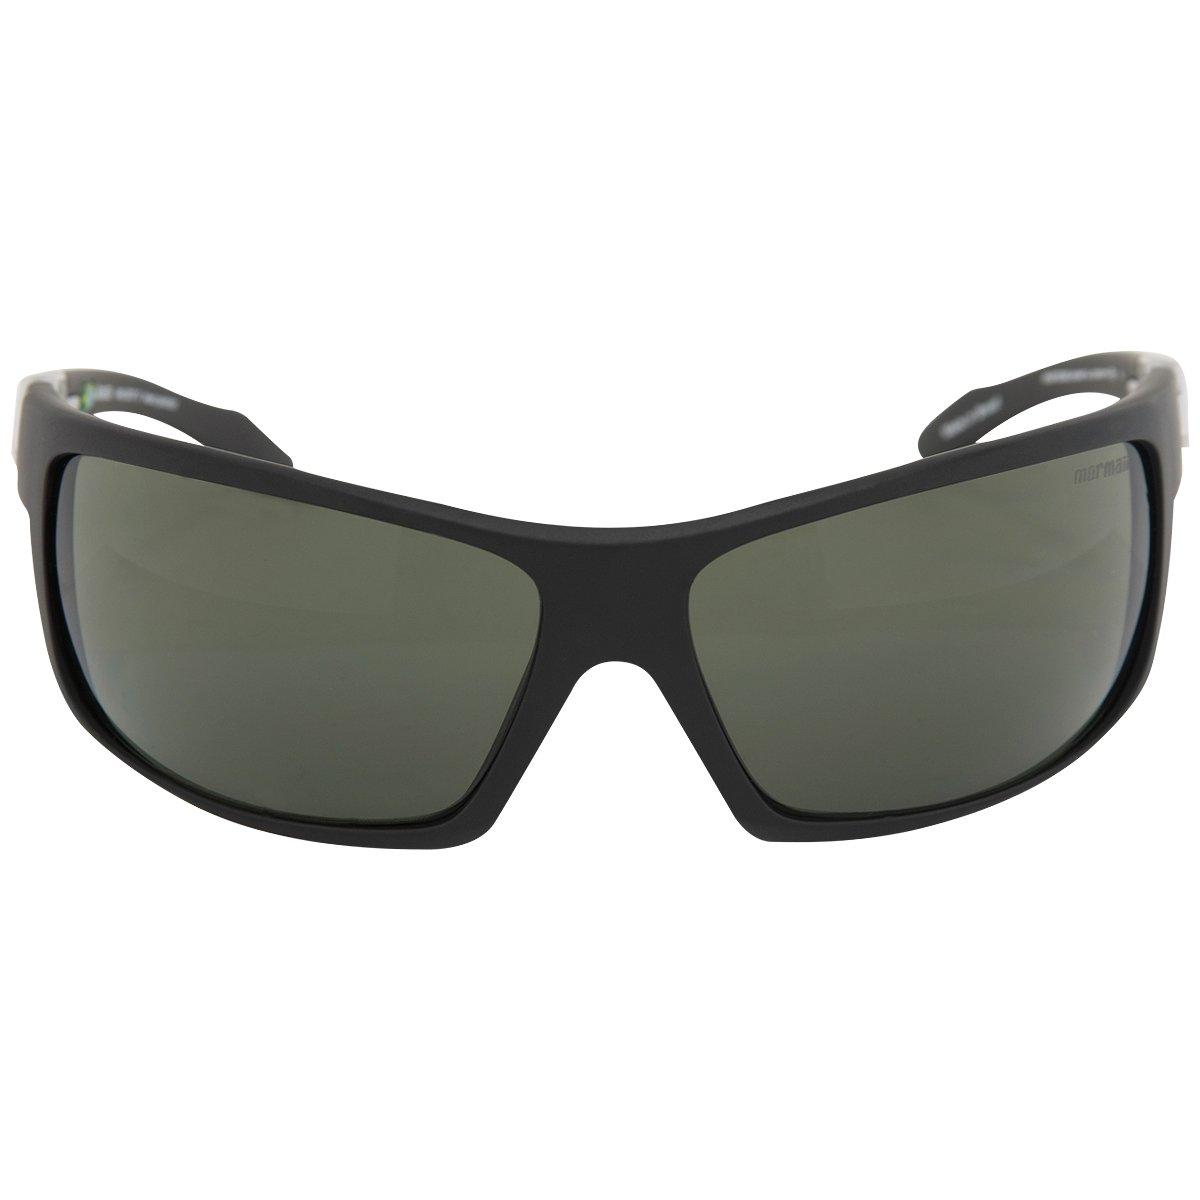 Óculos Mormaii Joaca - Compre Agora   Netshoes 4ec381bb10